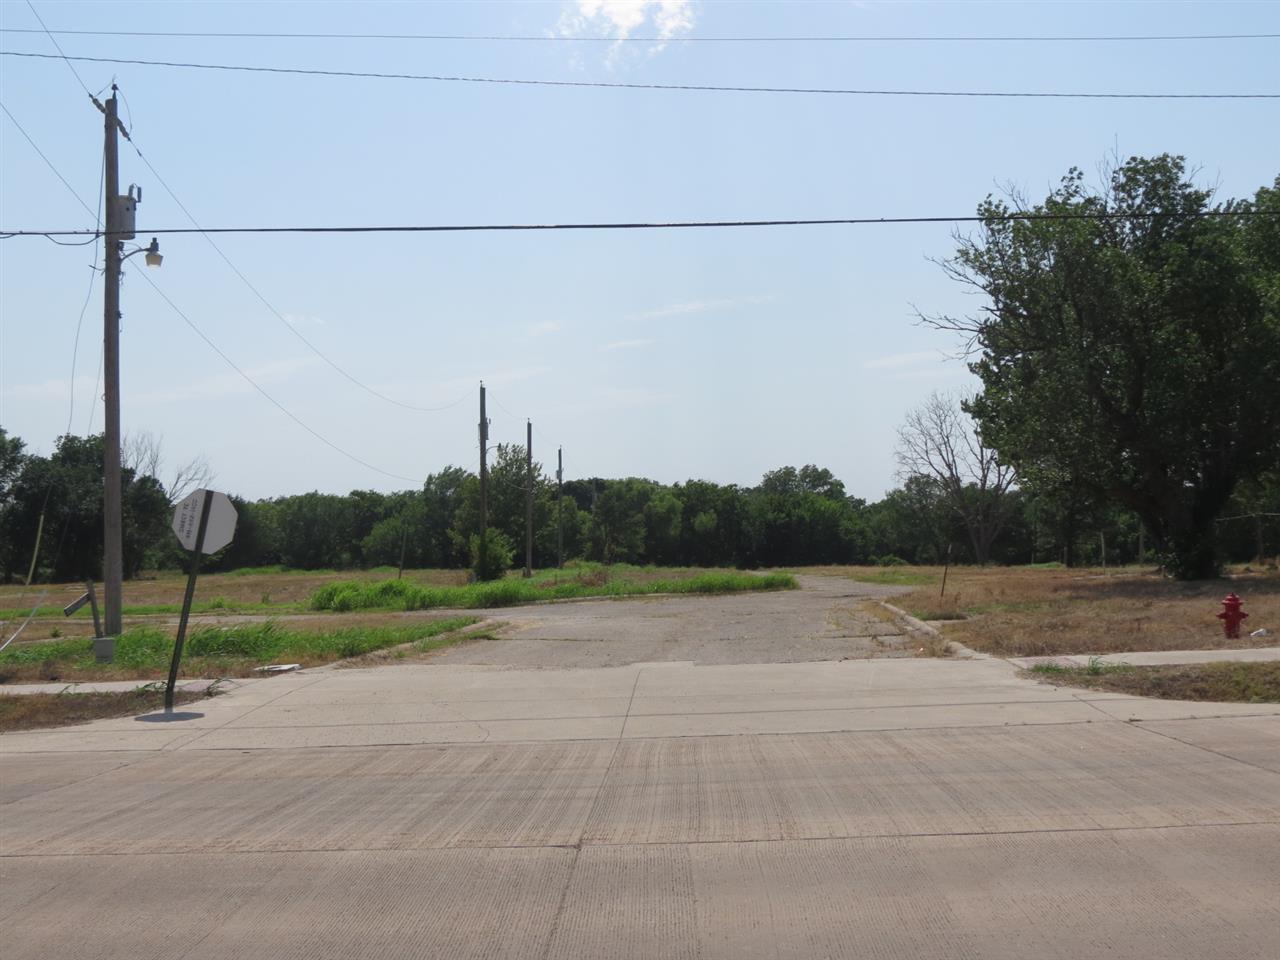 702 S Jardot Rd., Stillwater, OK 74074